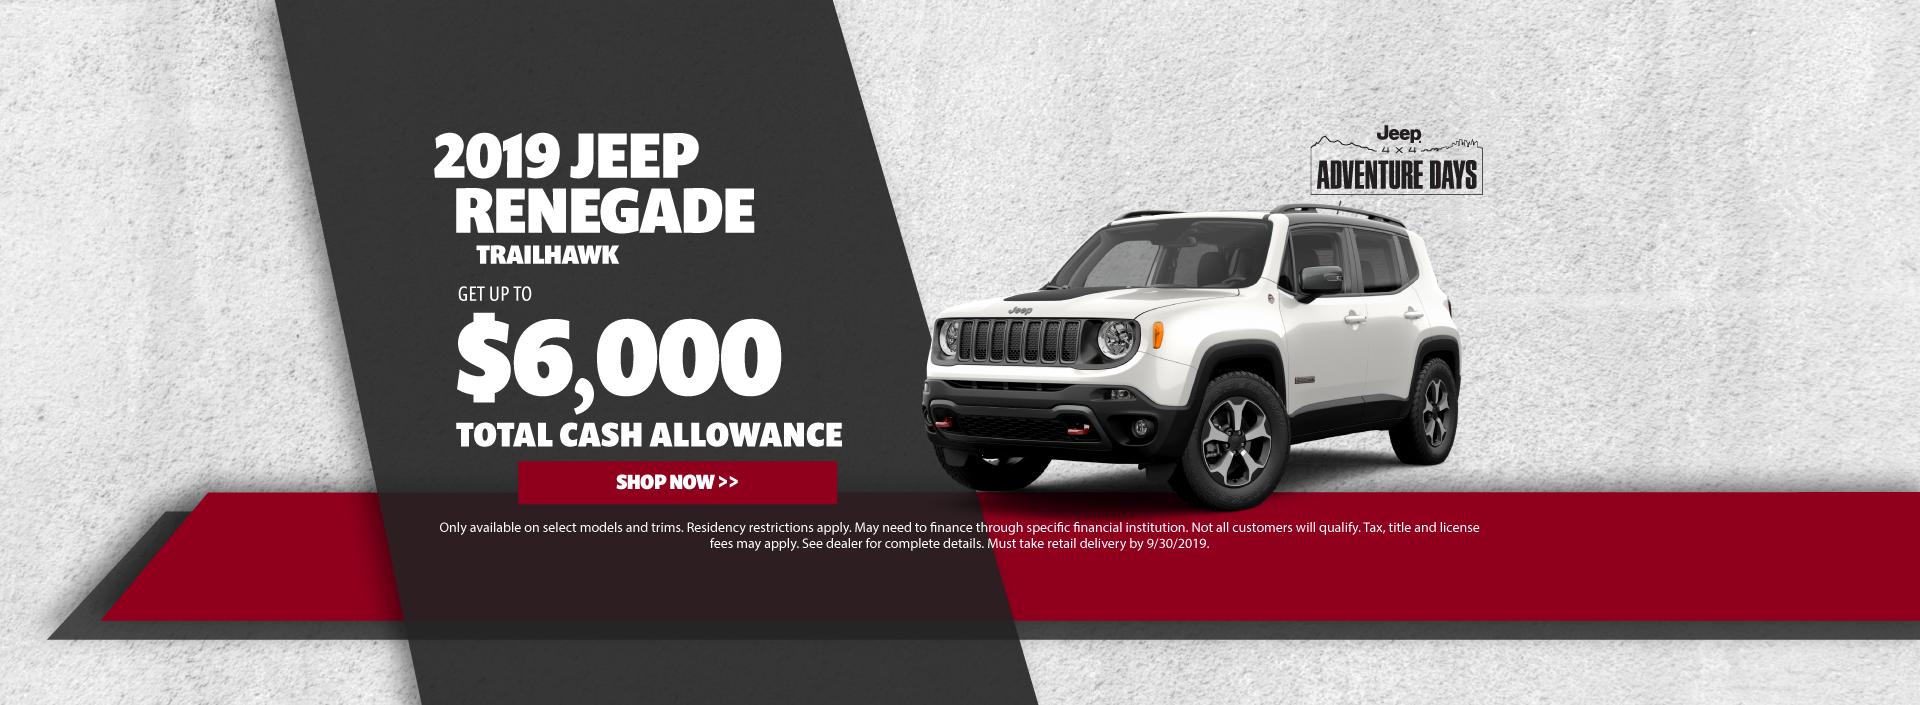 2019 Jeep Renegade Cash Offer